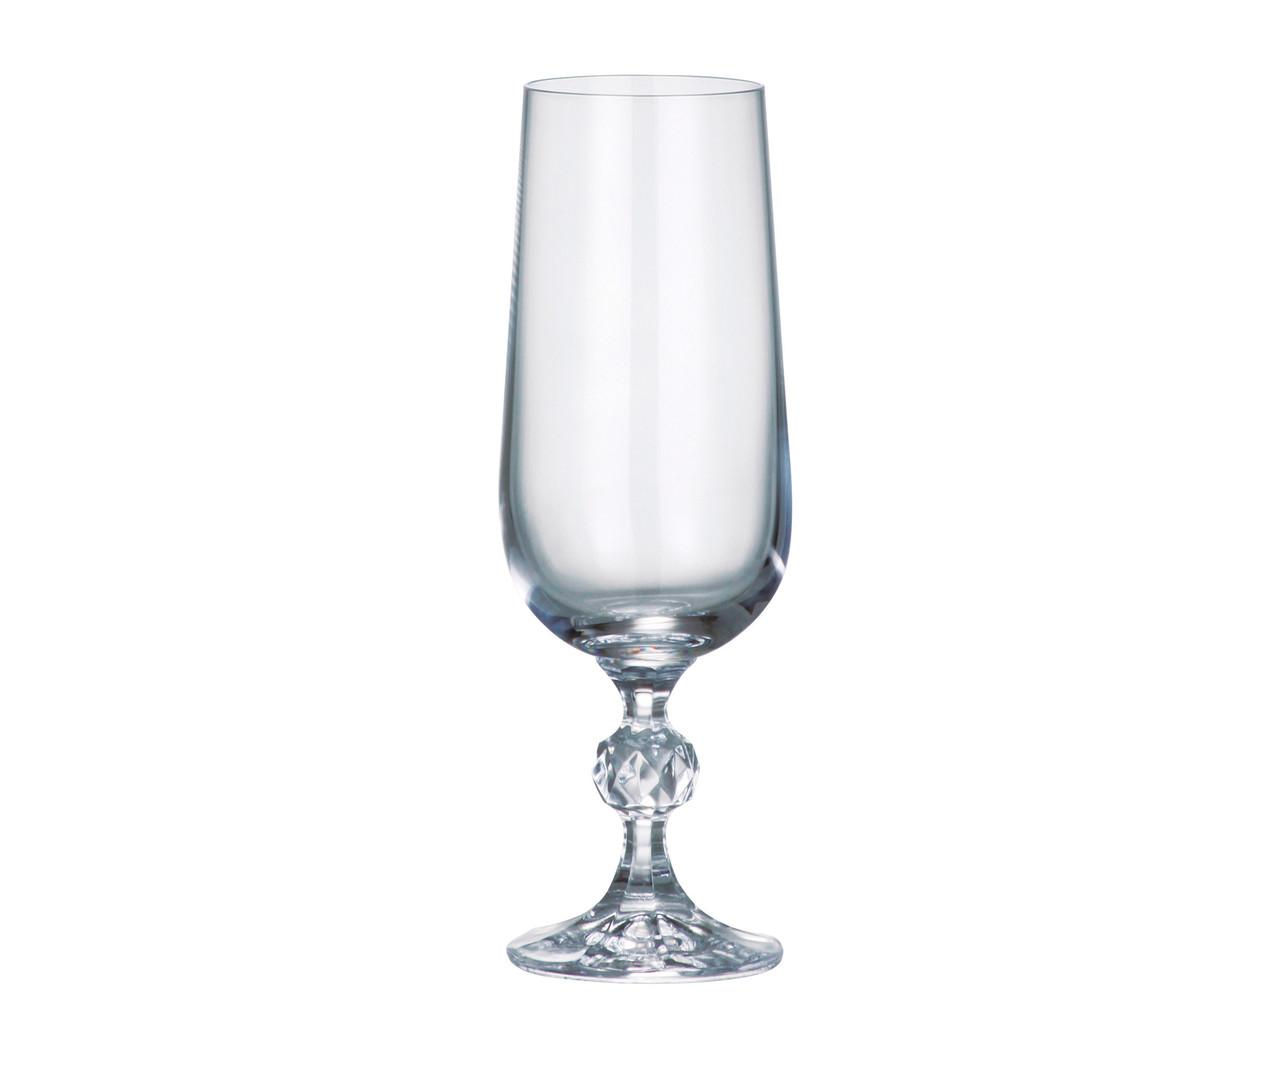 Bohemia Claudia Бокалы для шампанского 180 мл 6 шт Богемия Клаудия